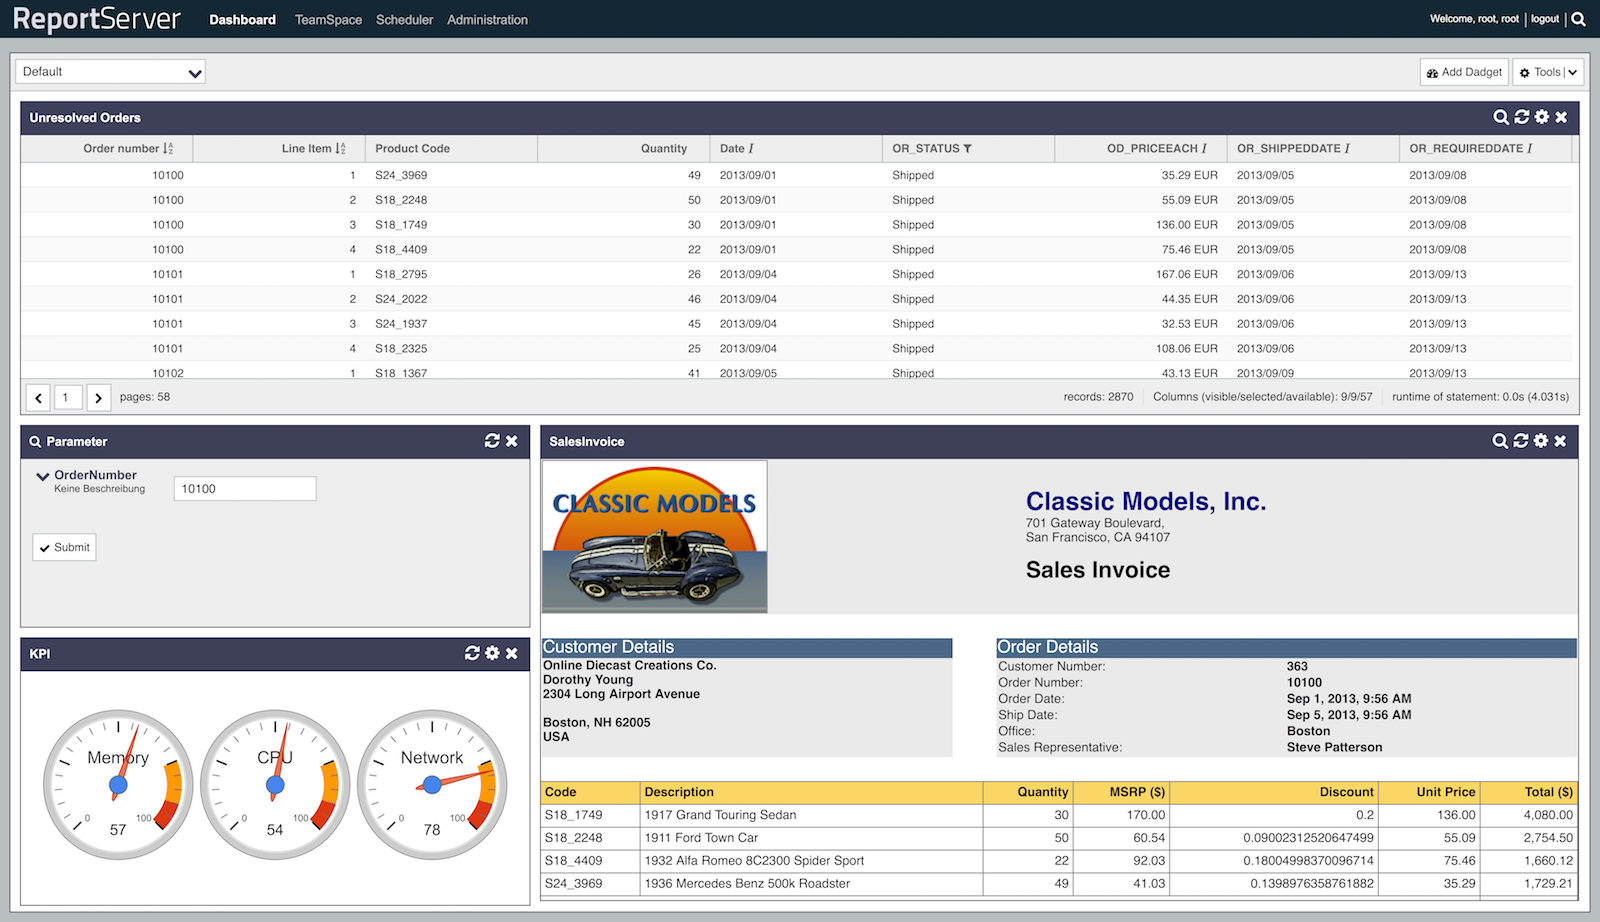 ReportServer Demo - ReportServer Dashboards